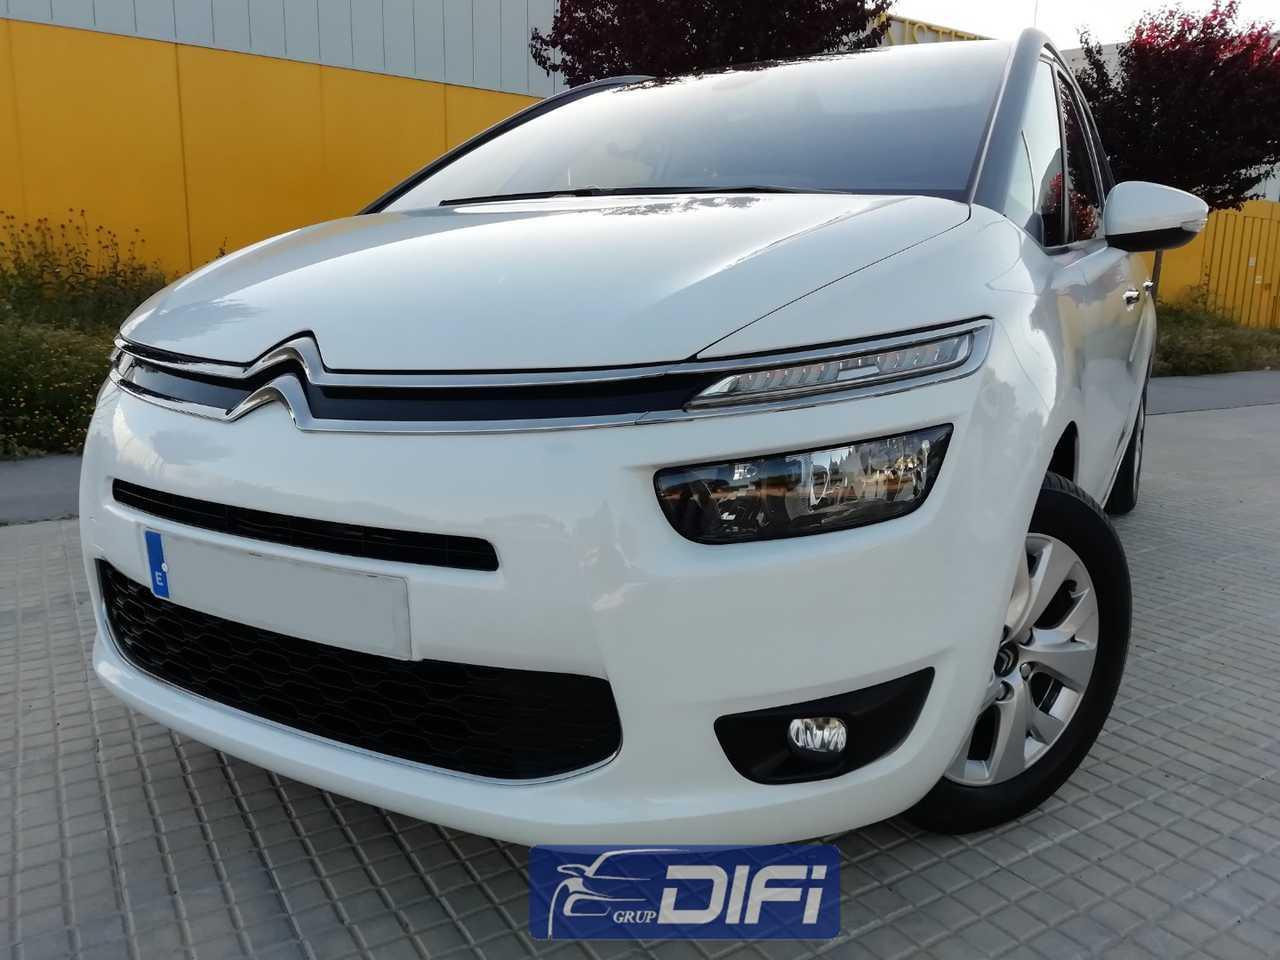 Citroën Grand C4 Picasso 1.6 HDI 115CV INTENS 7 PLAZAS   - Foto 1